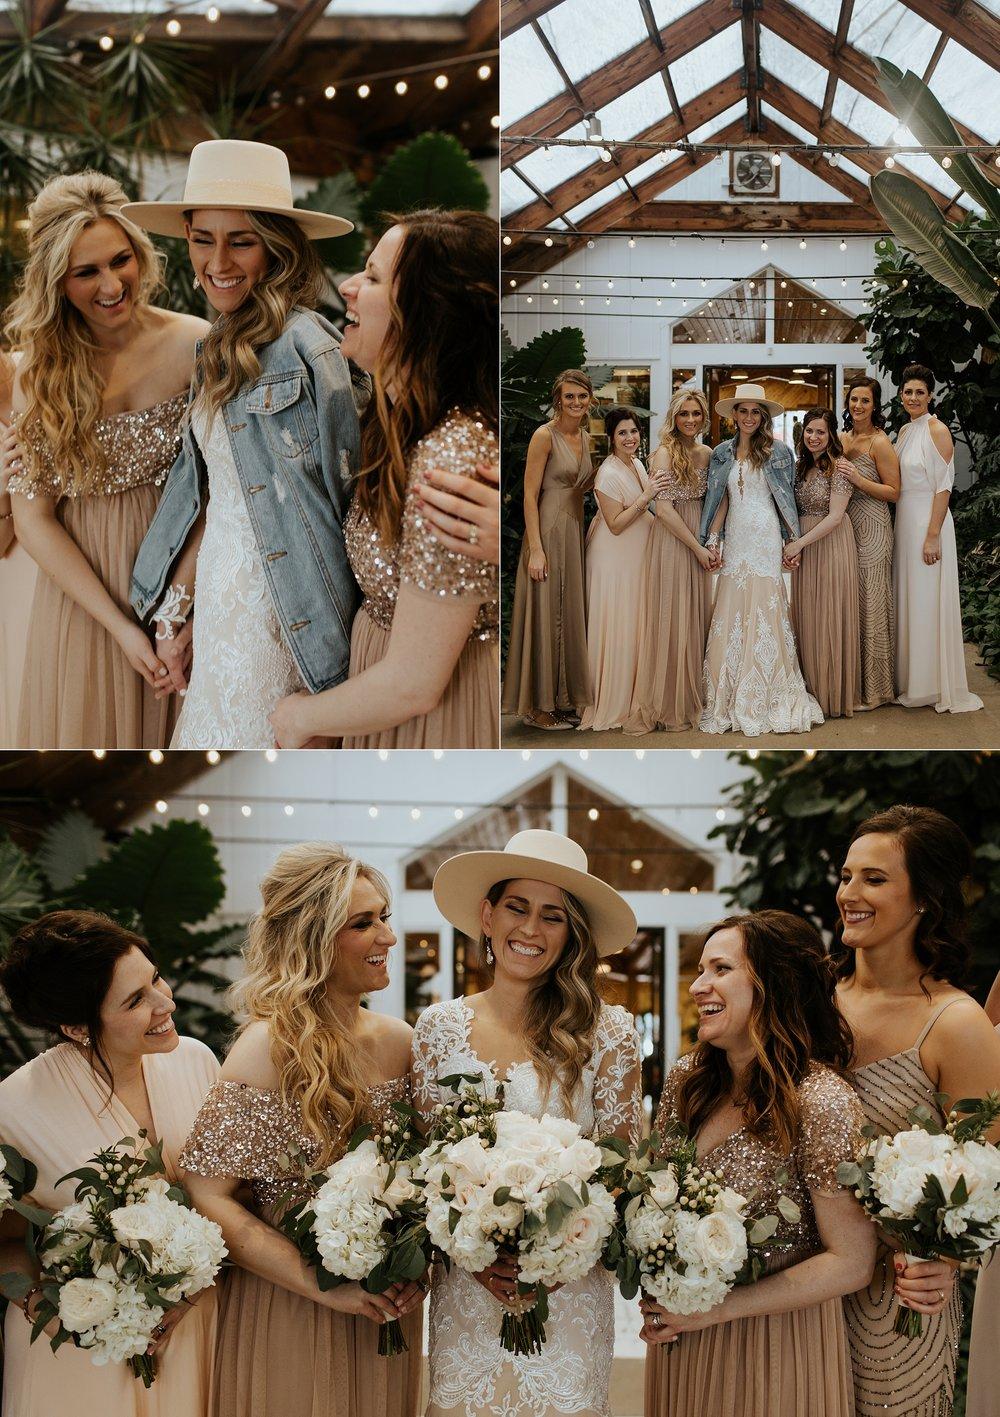 Founders One Nine Winter Garden Omaha Wedding_0007.jpg